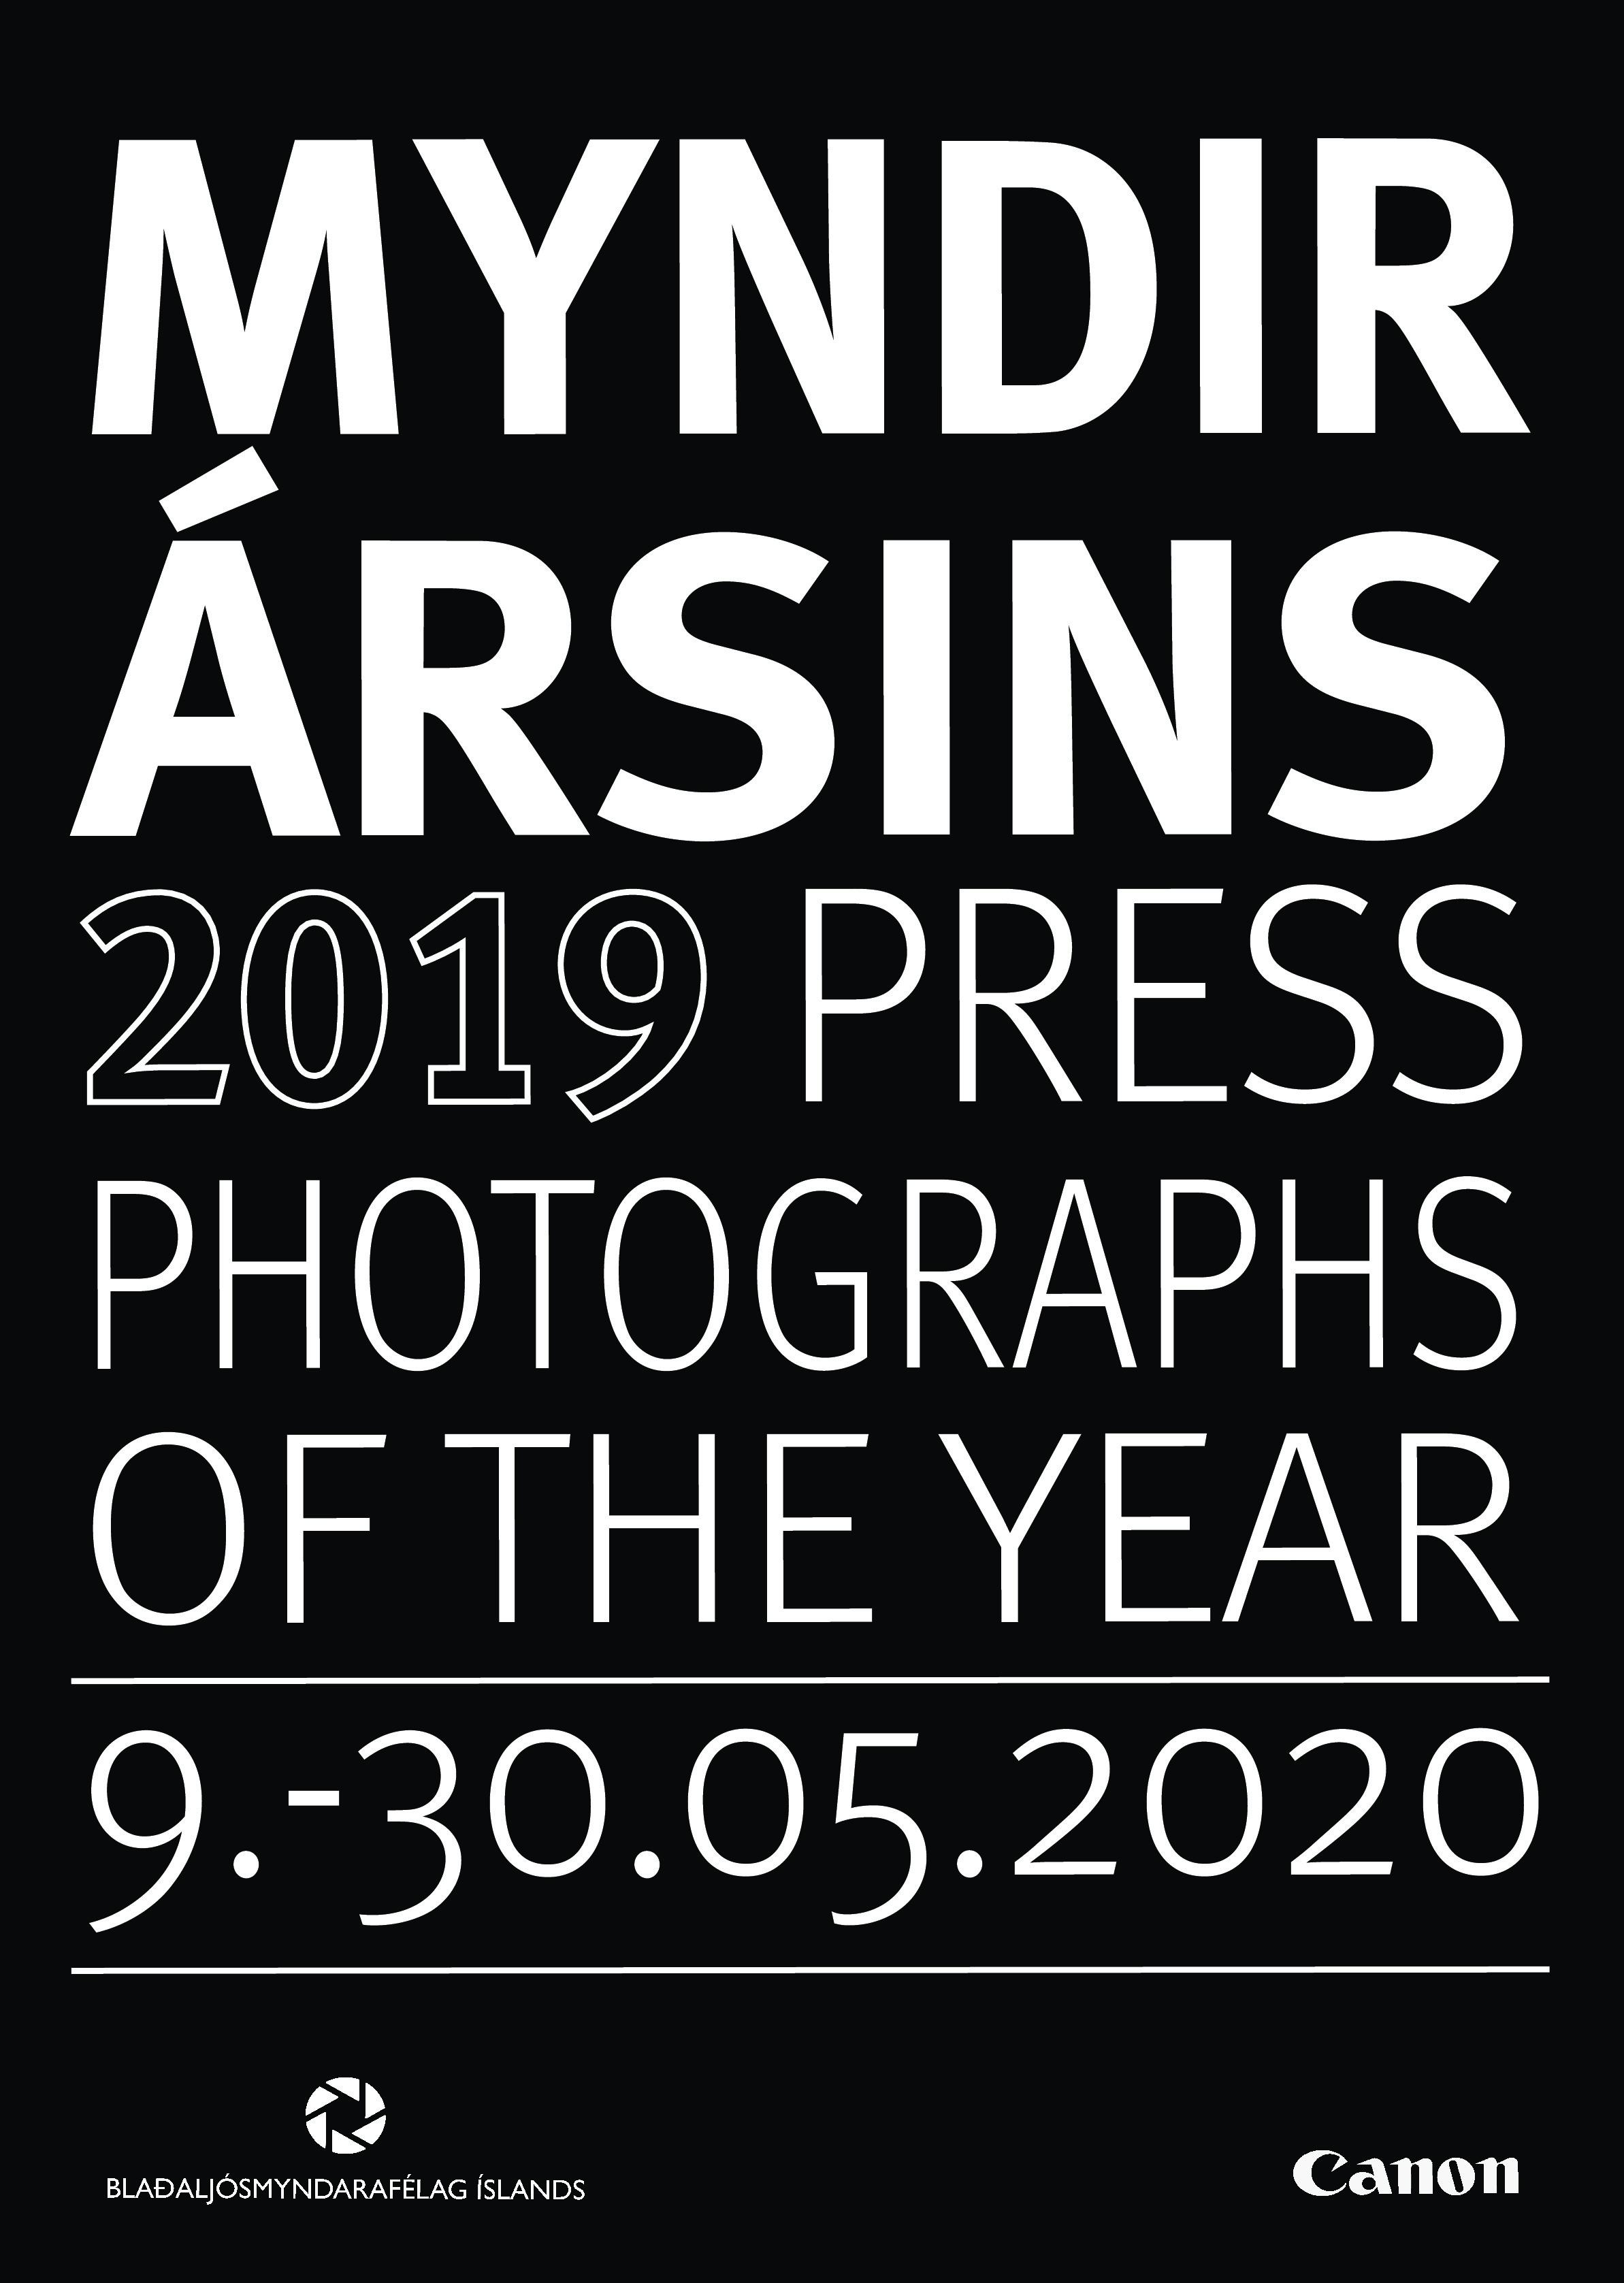 Myndir ársins 2019 / Photographs of they year 2019